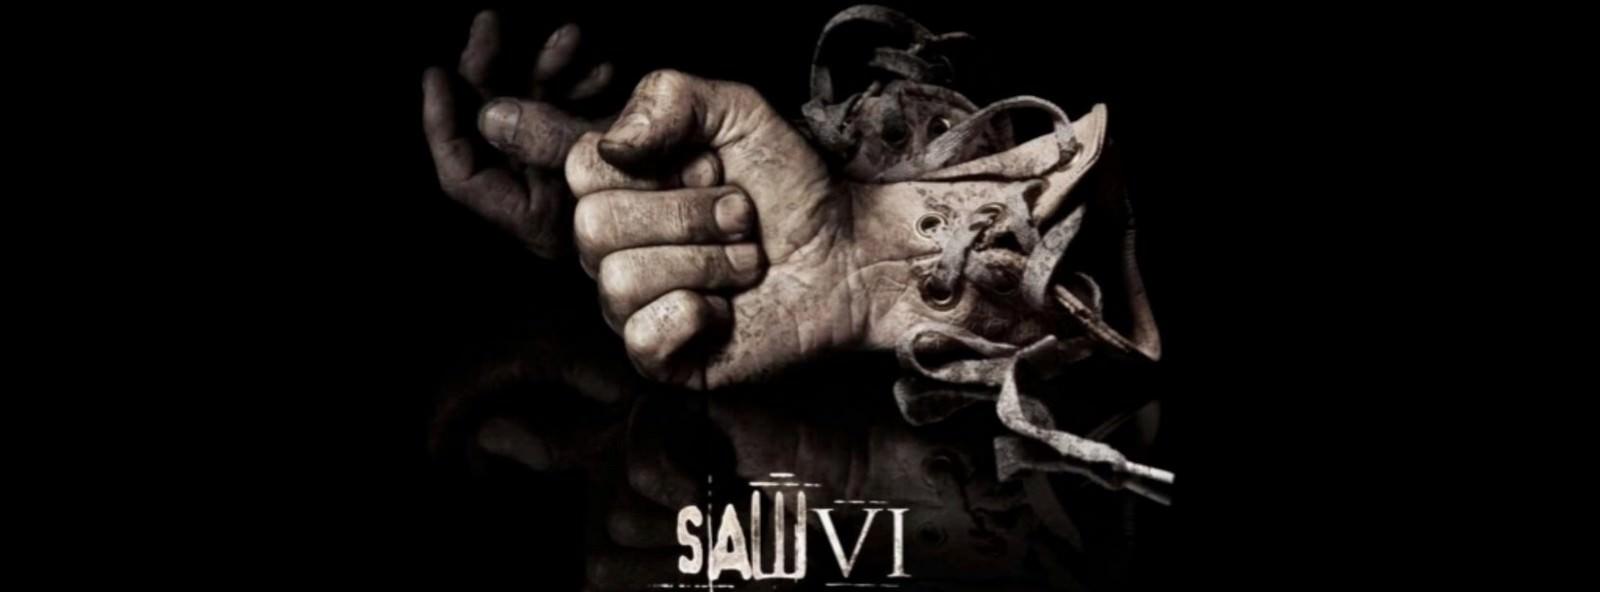 Movie, Saw VI(美國, 2009年) / 奪魂鋸6(台灣) / 恐懼鬥室6:萬罰朝中(香港) / 电锯惊魂6(網路), 電影海報, 美國, 橫版